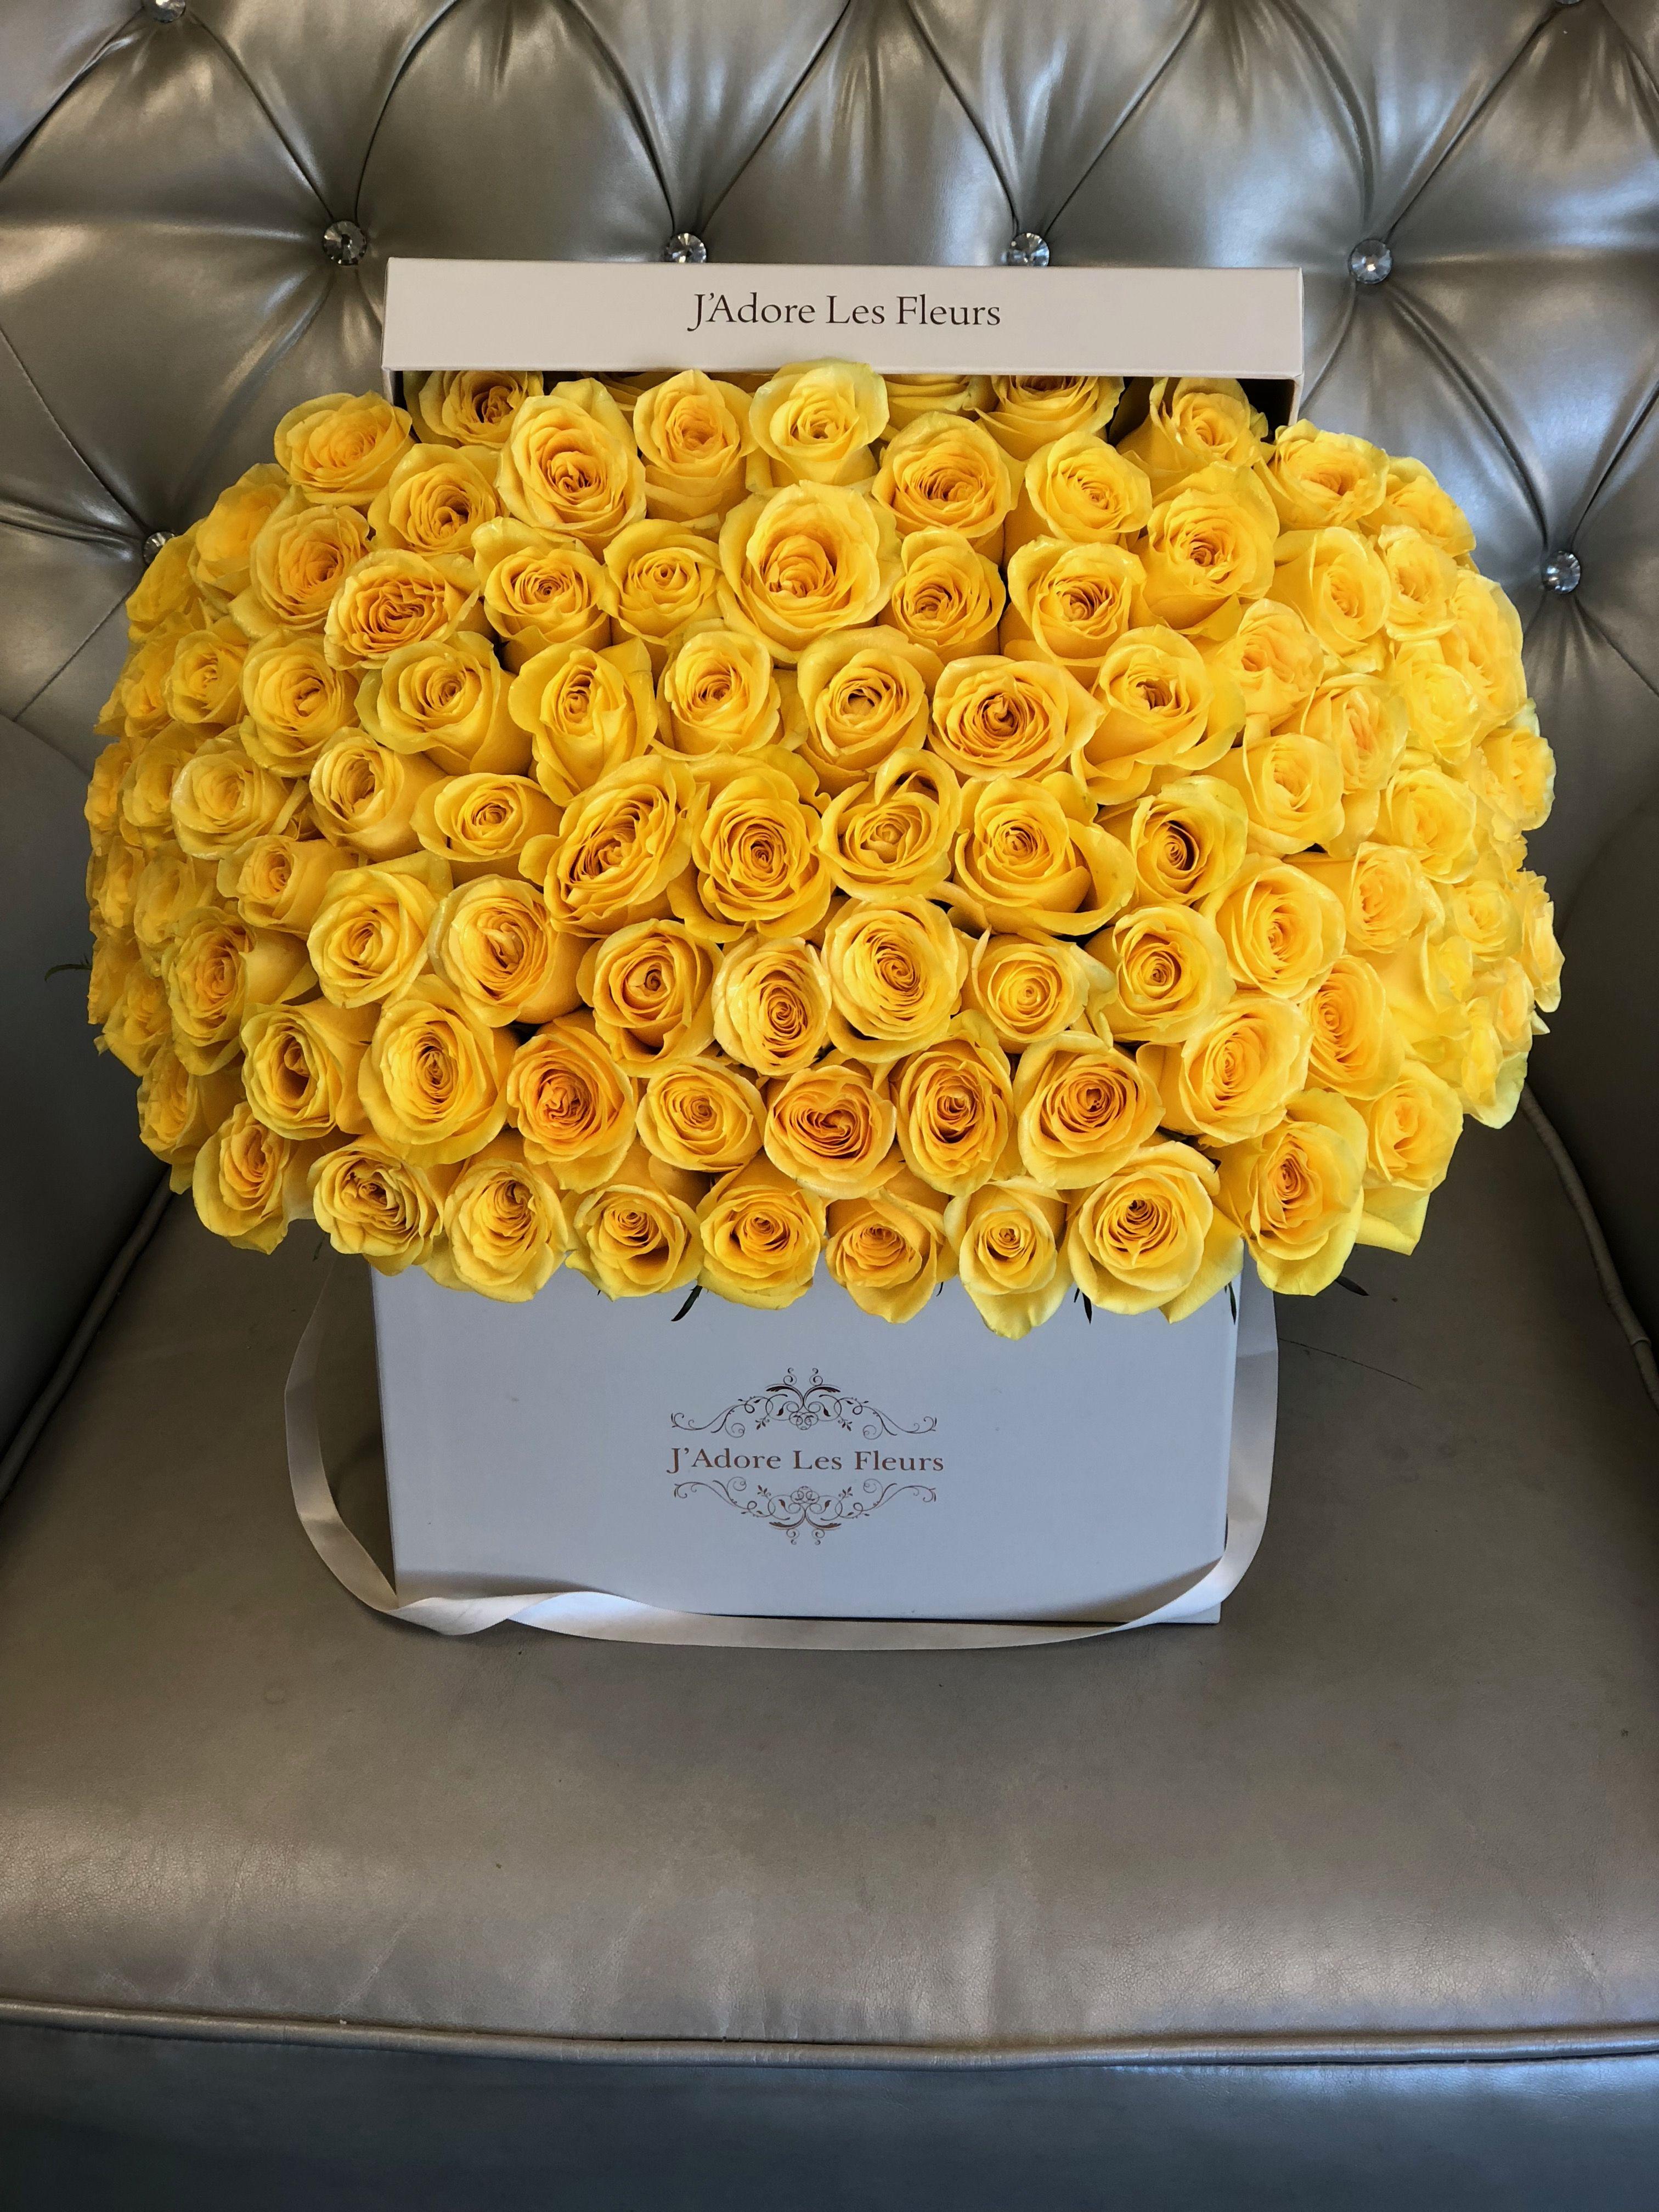 Jlf Signature R 100 Yellow Rose Box Jlf Jadorelesfleurs Yellowroses Roses Yellow Roses Ordering Roses Flowers Bouquet Gift